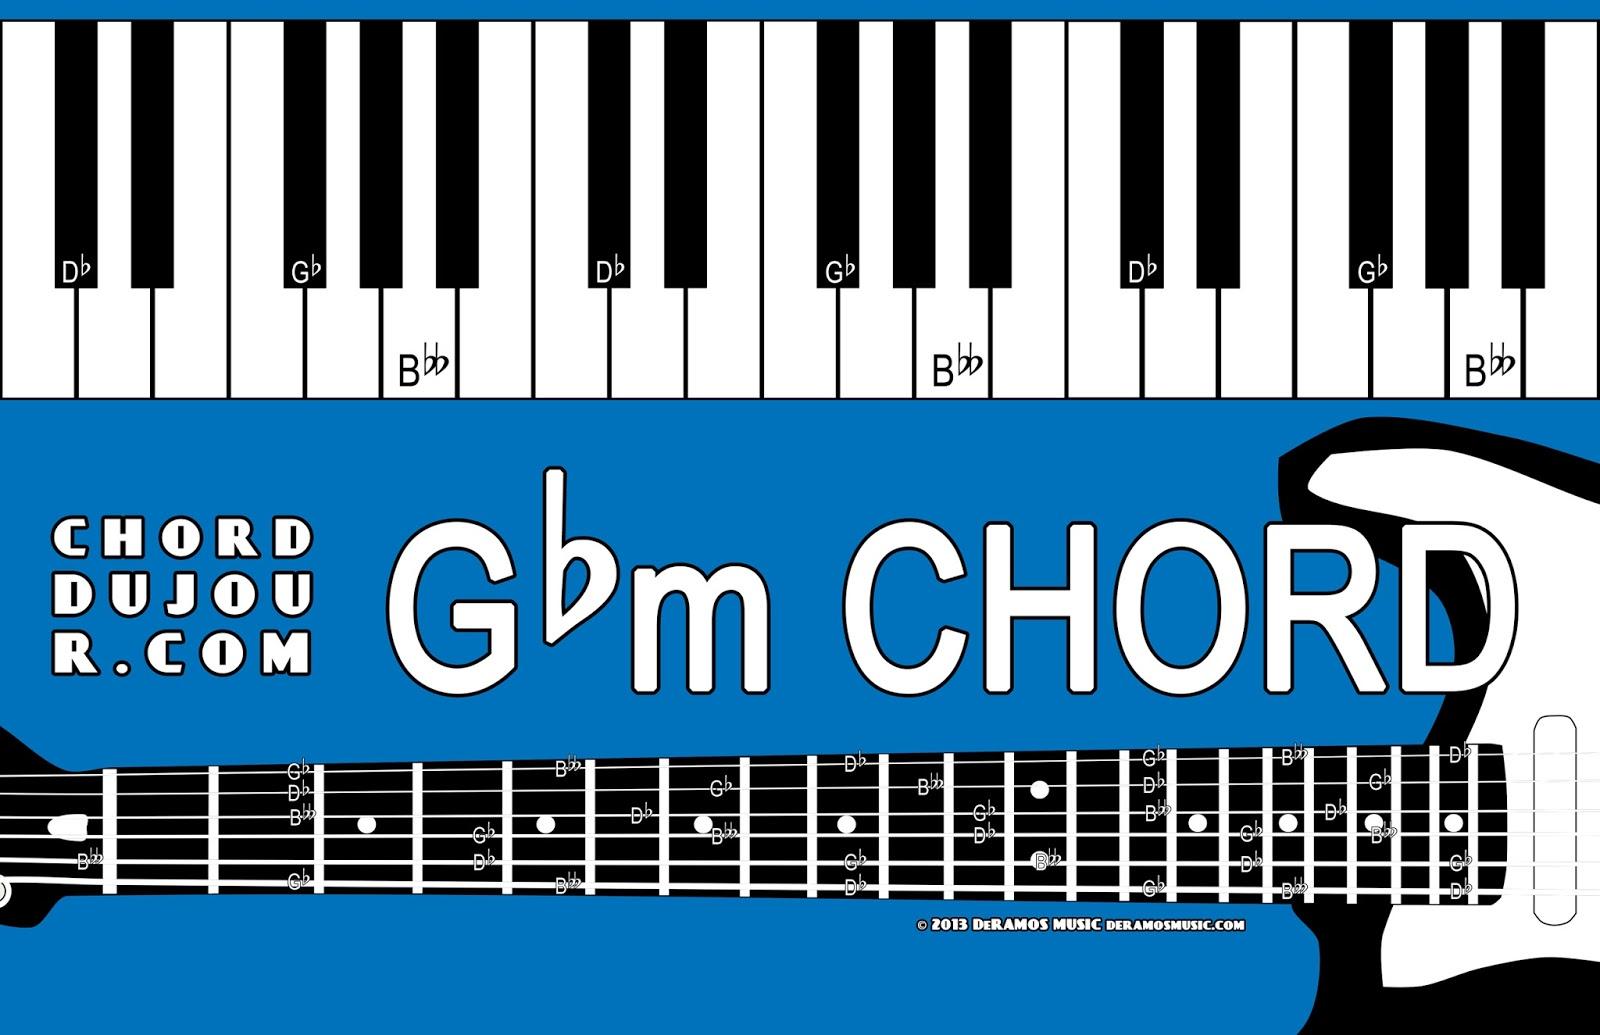 Chord Du Jour Dictionary Gbm Chord